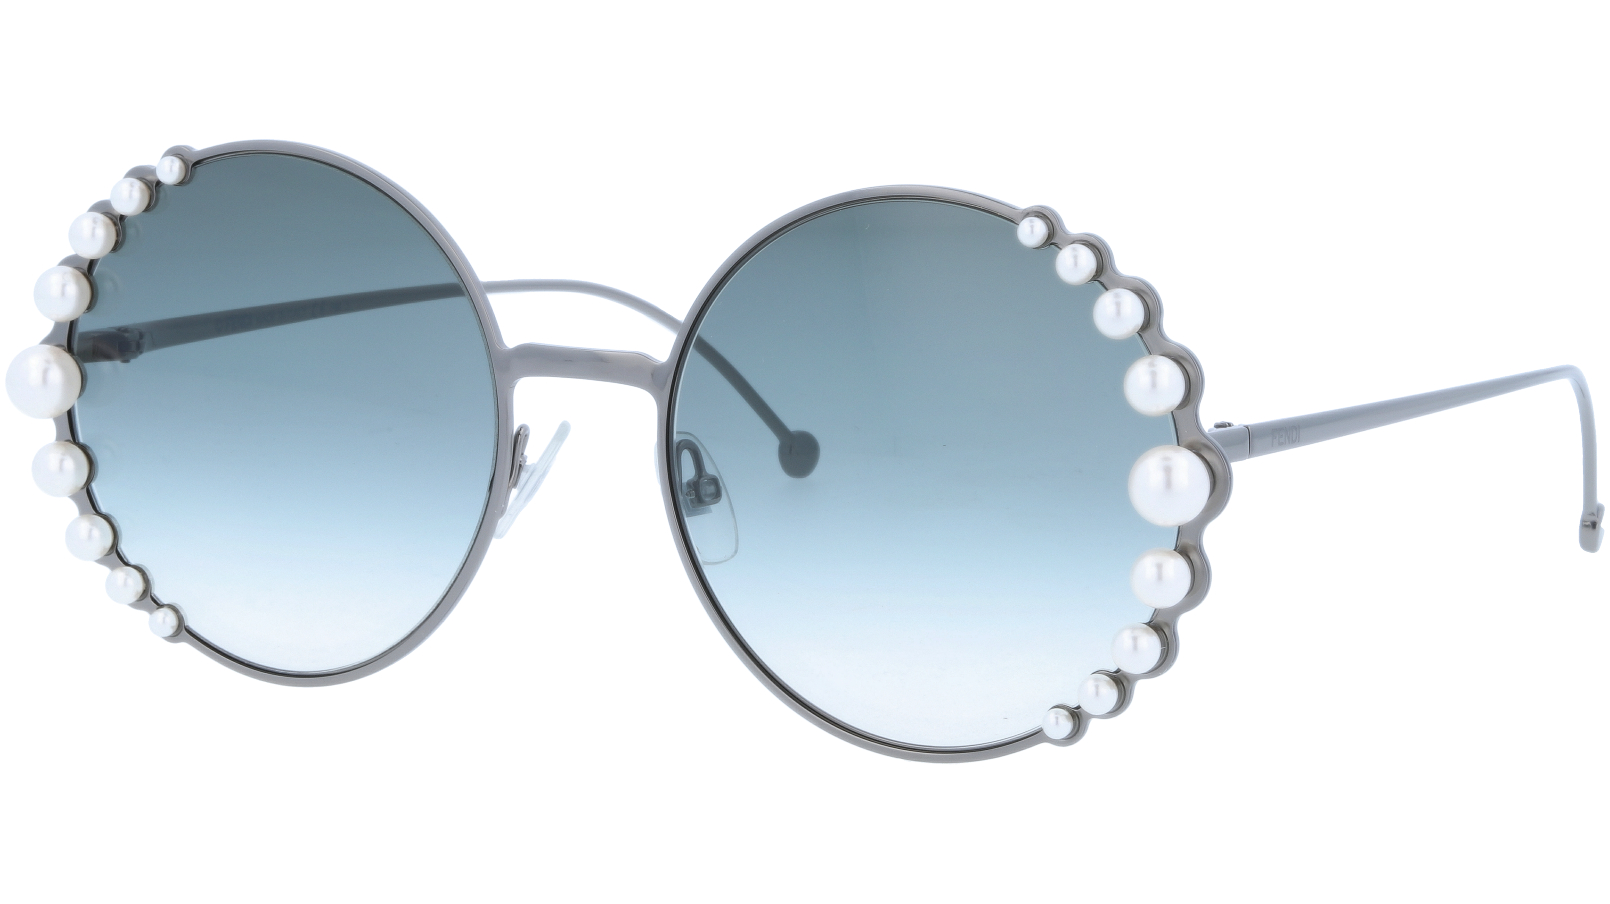 FENDI FF0295/S KJ190 58 DK Ruthenium Pearl Sunglasses